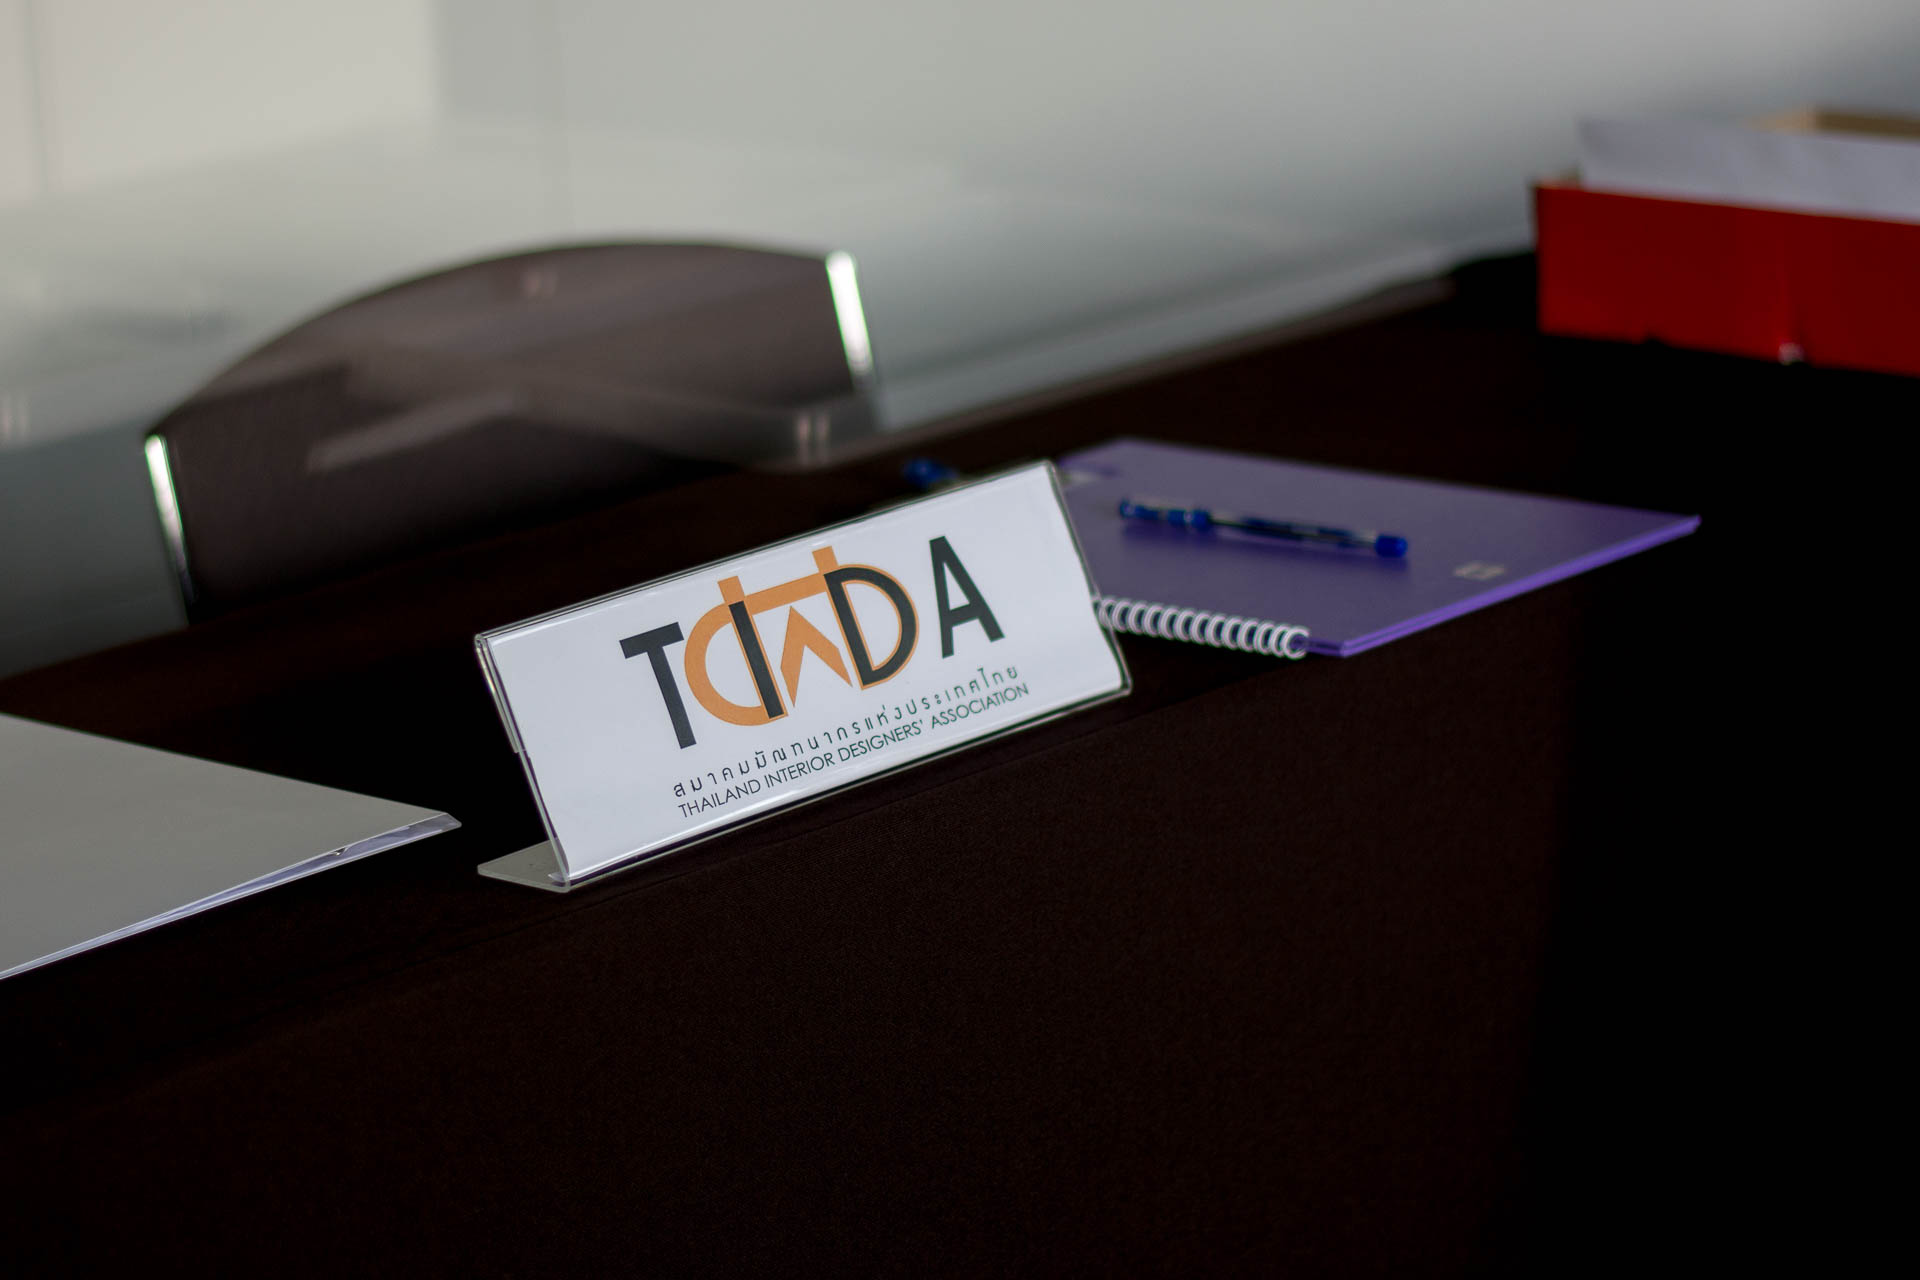 TIDA Thesis Awards 2017 (รอบตัดสิน : นำเสนอผลงานผู้เข้ารอบสุดท้าย)